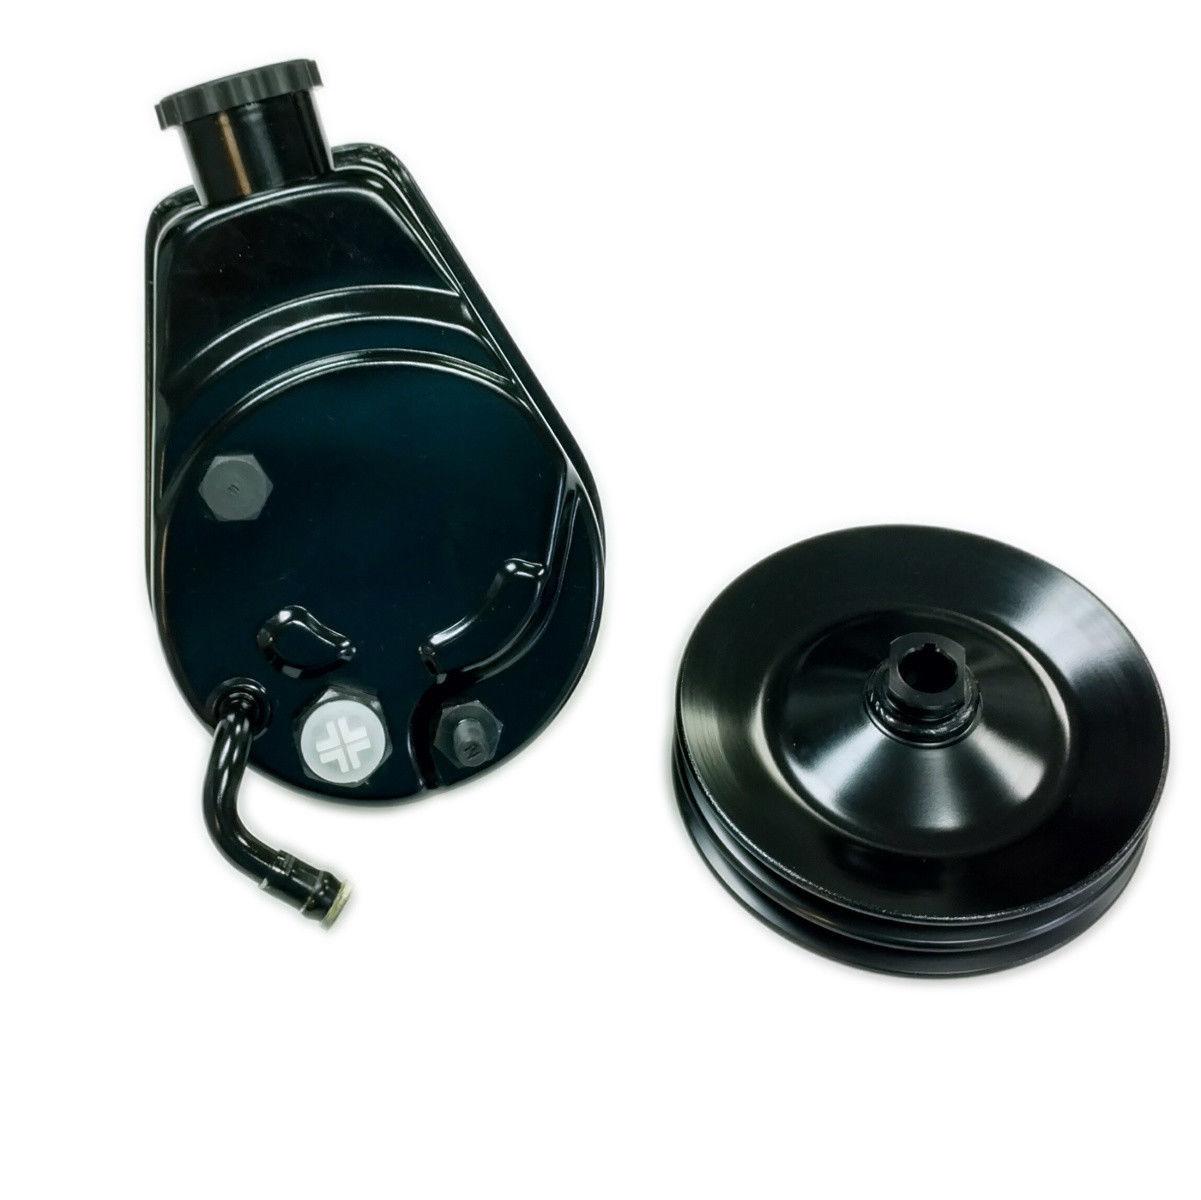 Saginaw Power Steering Pump >> Bbc Sbc Chevy Black Saginaw Style Power Steering Pump W Double